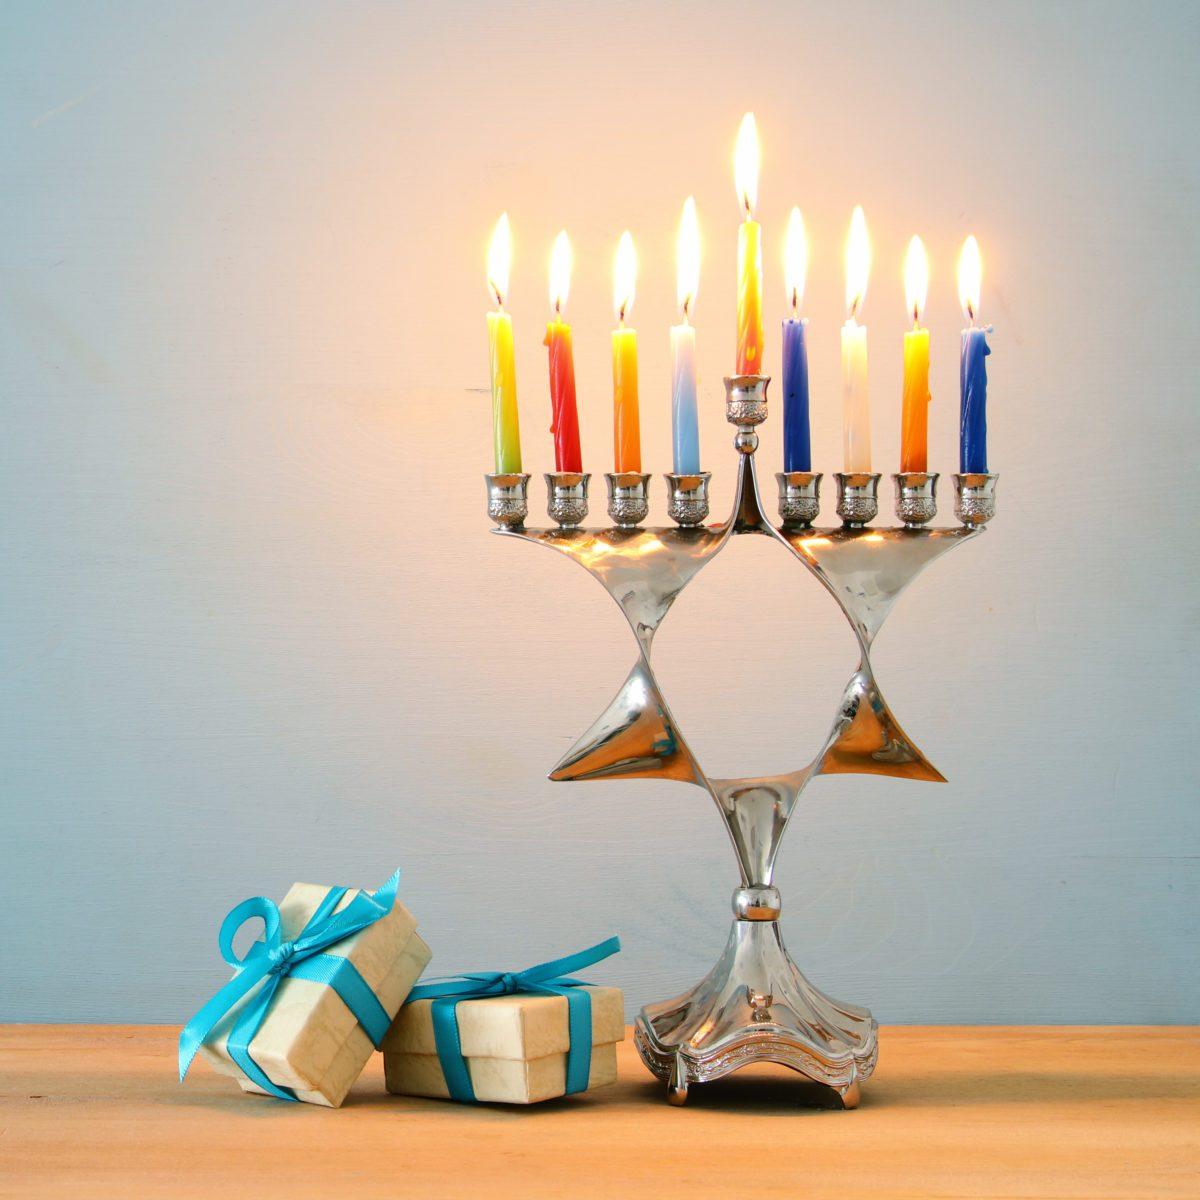 17 Best Hanukah-Themed Gifts